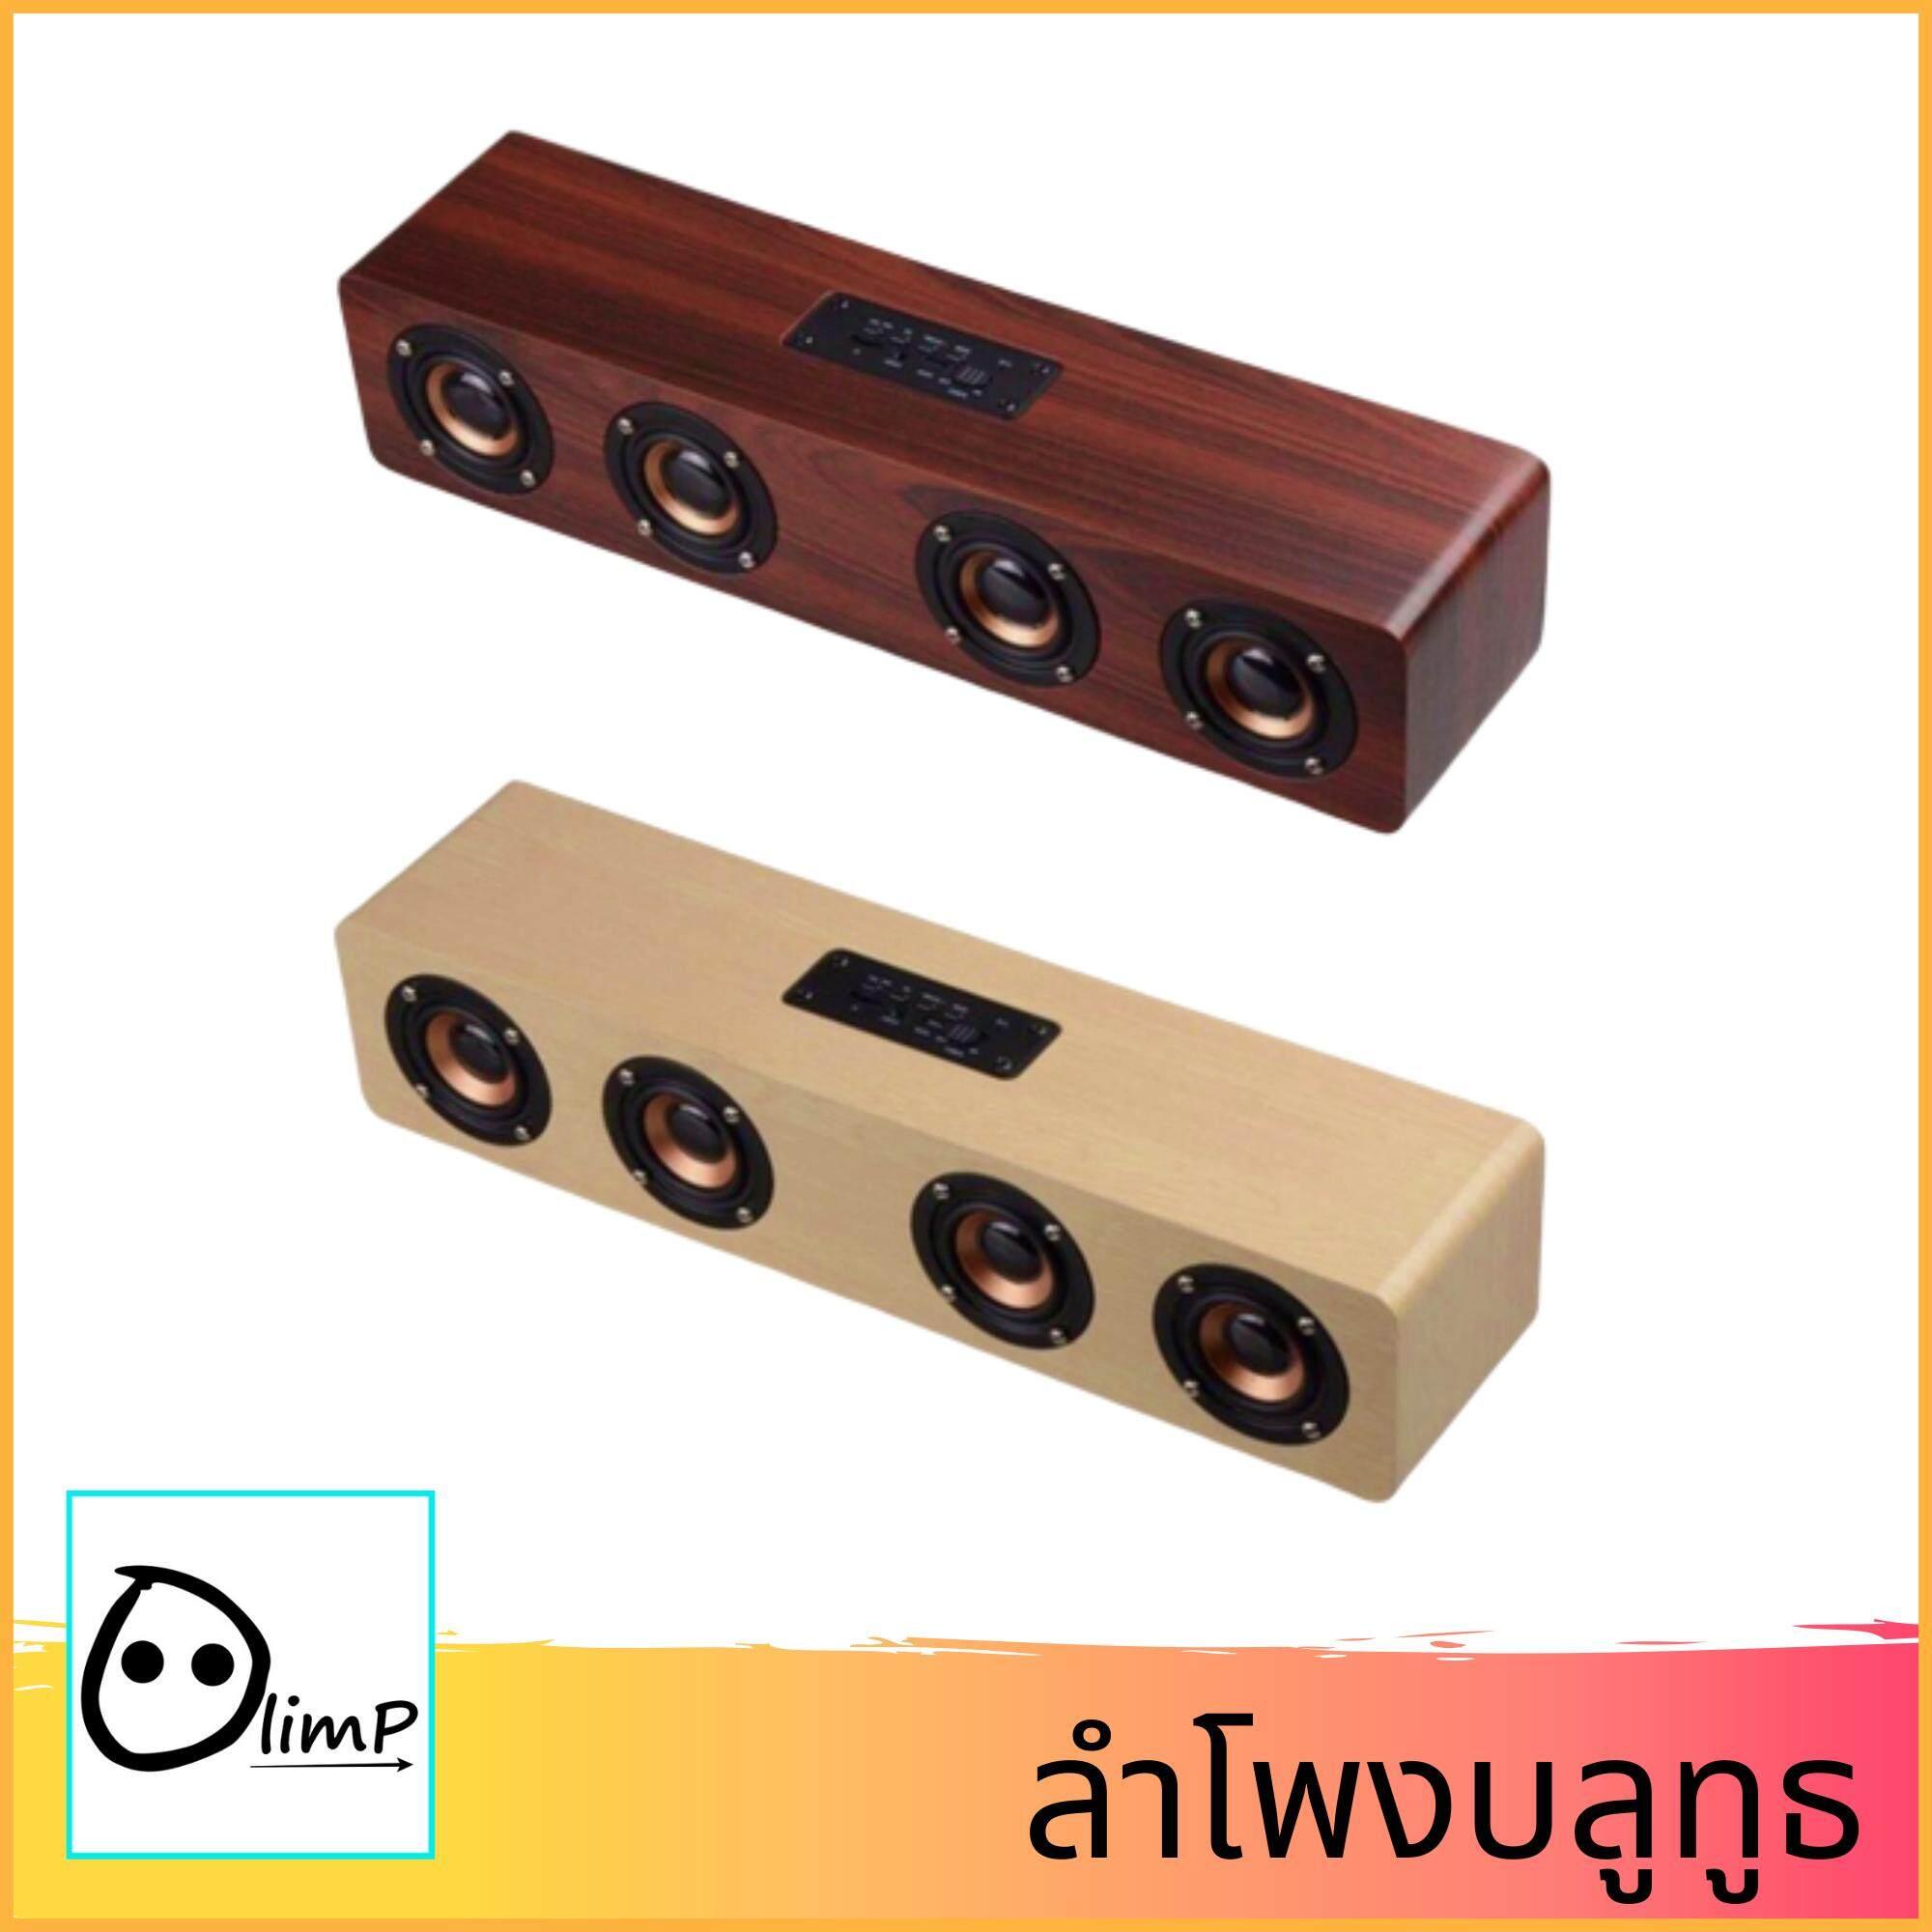 Bluetooth Speaker W8 ดอกลำโพง 4 ดอก 12วัตต์ ลำโพง ลำโพงบลูทูธ ลำโพงคอม ซาวด์บาร์ ตู้ลำโพง ลำโพงbluetooth ลำโพงjbl ซับวูฟเฟอร์ ตู้ซับเบส เครื่องเสียง ลำโพงพกพา ลำโพงเคลื่อนที่ มินิลำโพง ลําโพงlazada ลําโพงเบสหนัก ลําโพงxiaomi ลำโพงmi ลําโพงต่อโทรศัพท์.